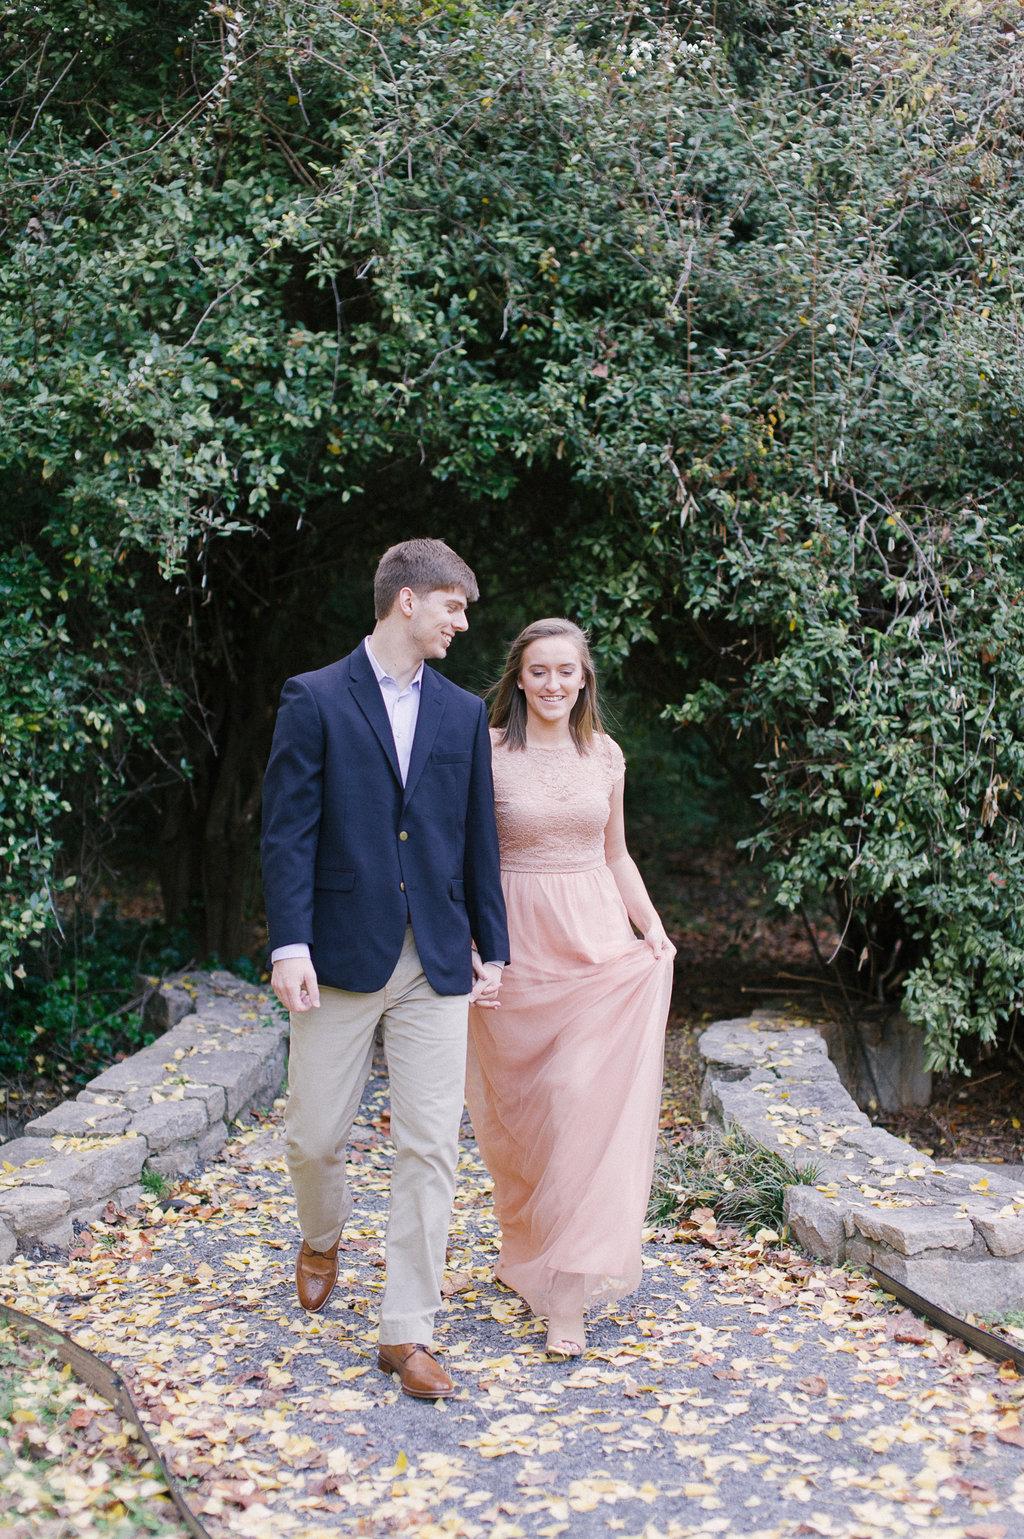 Cator-woolford-gardens-wedding-photography-hannah-forsberg-atlanta-3.jpg